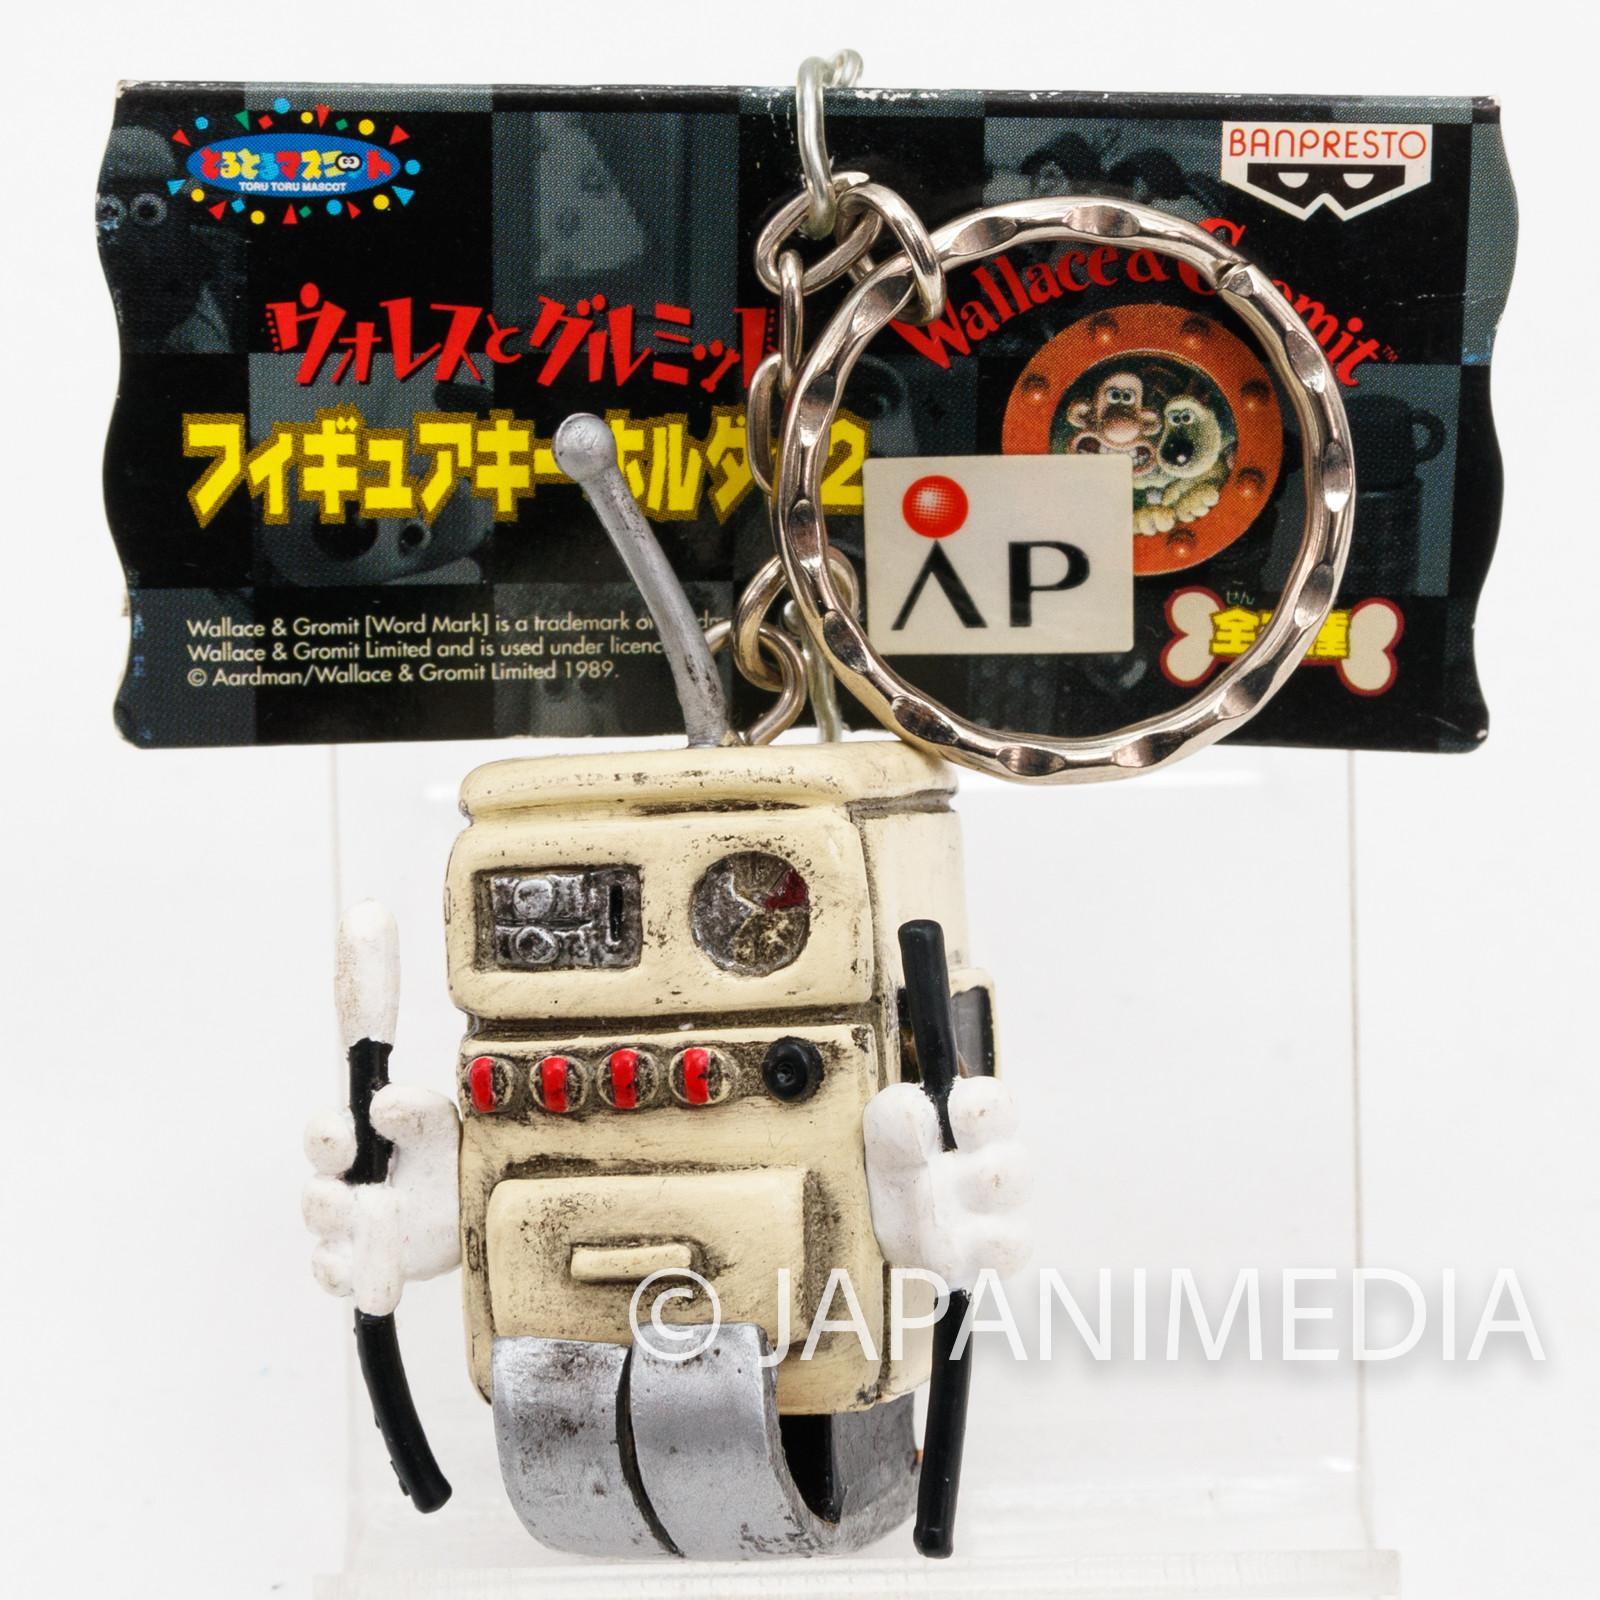 Wallace & Gromit Cooker Robot Figure Key Chain 2 Banpresto JAPAN Ardman ANIME